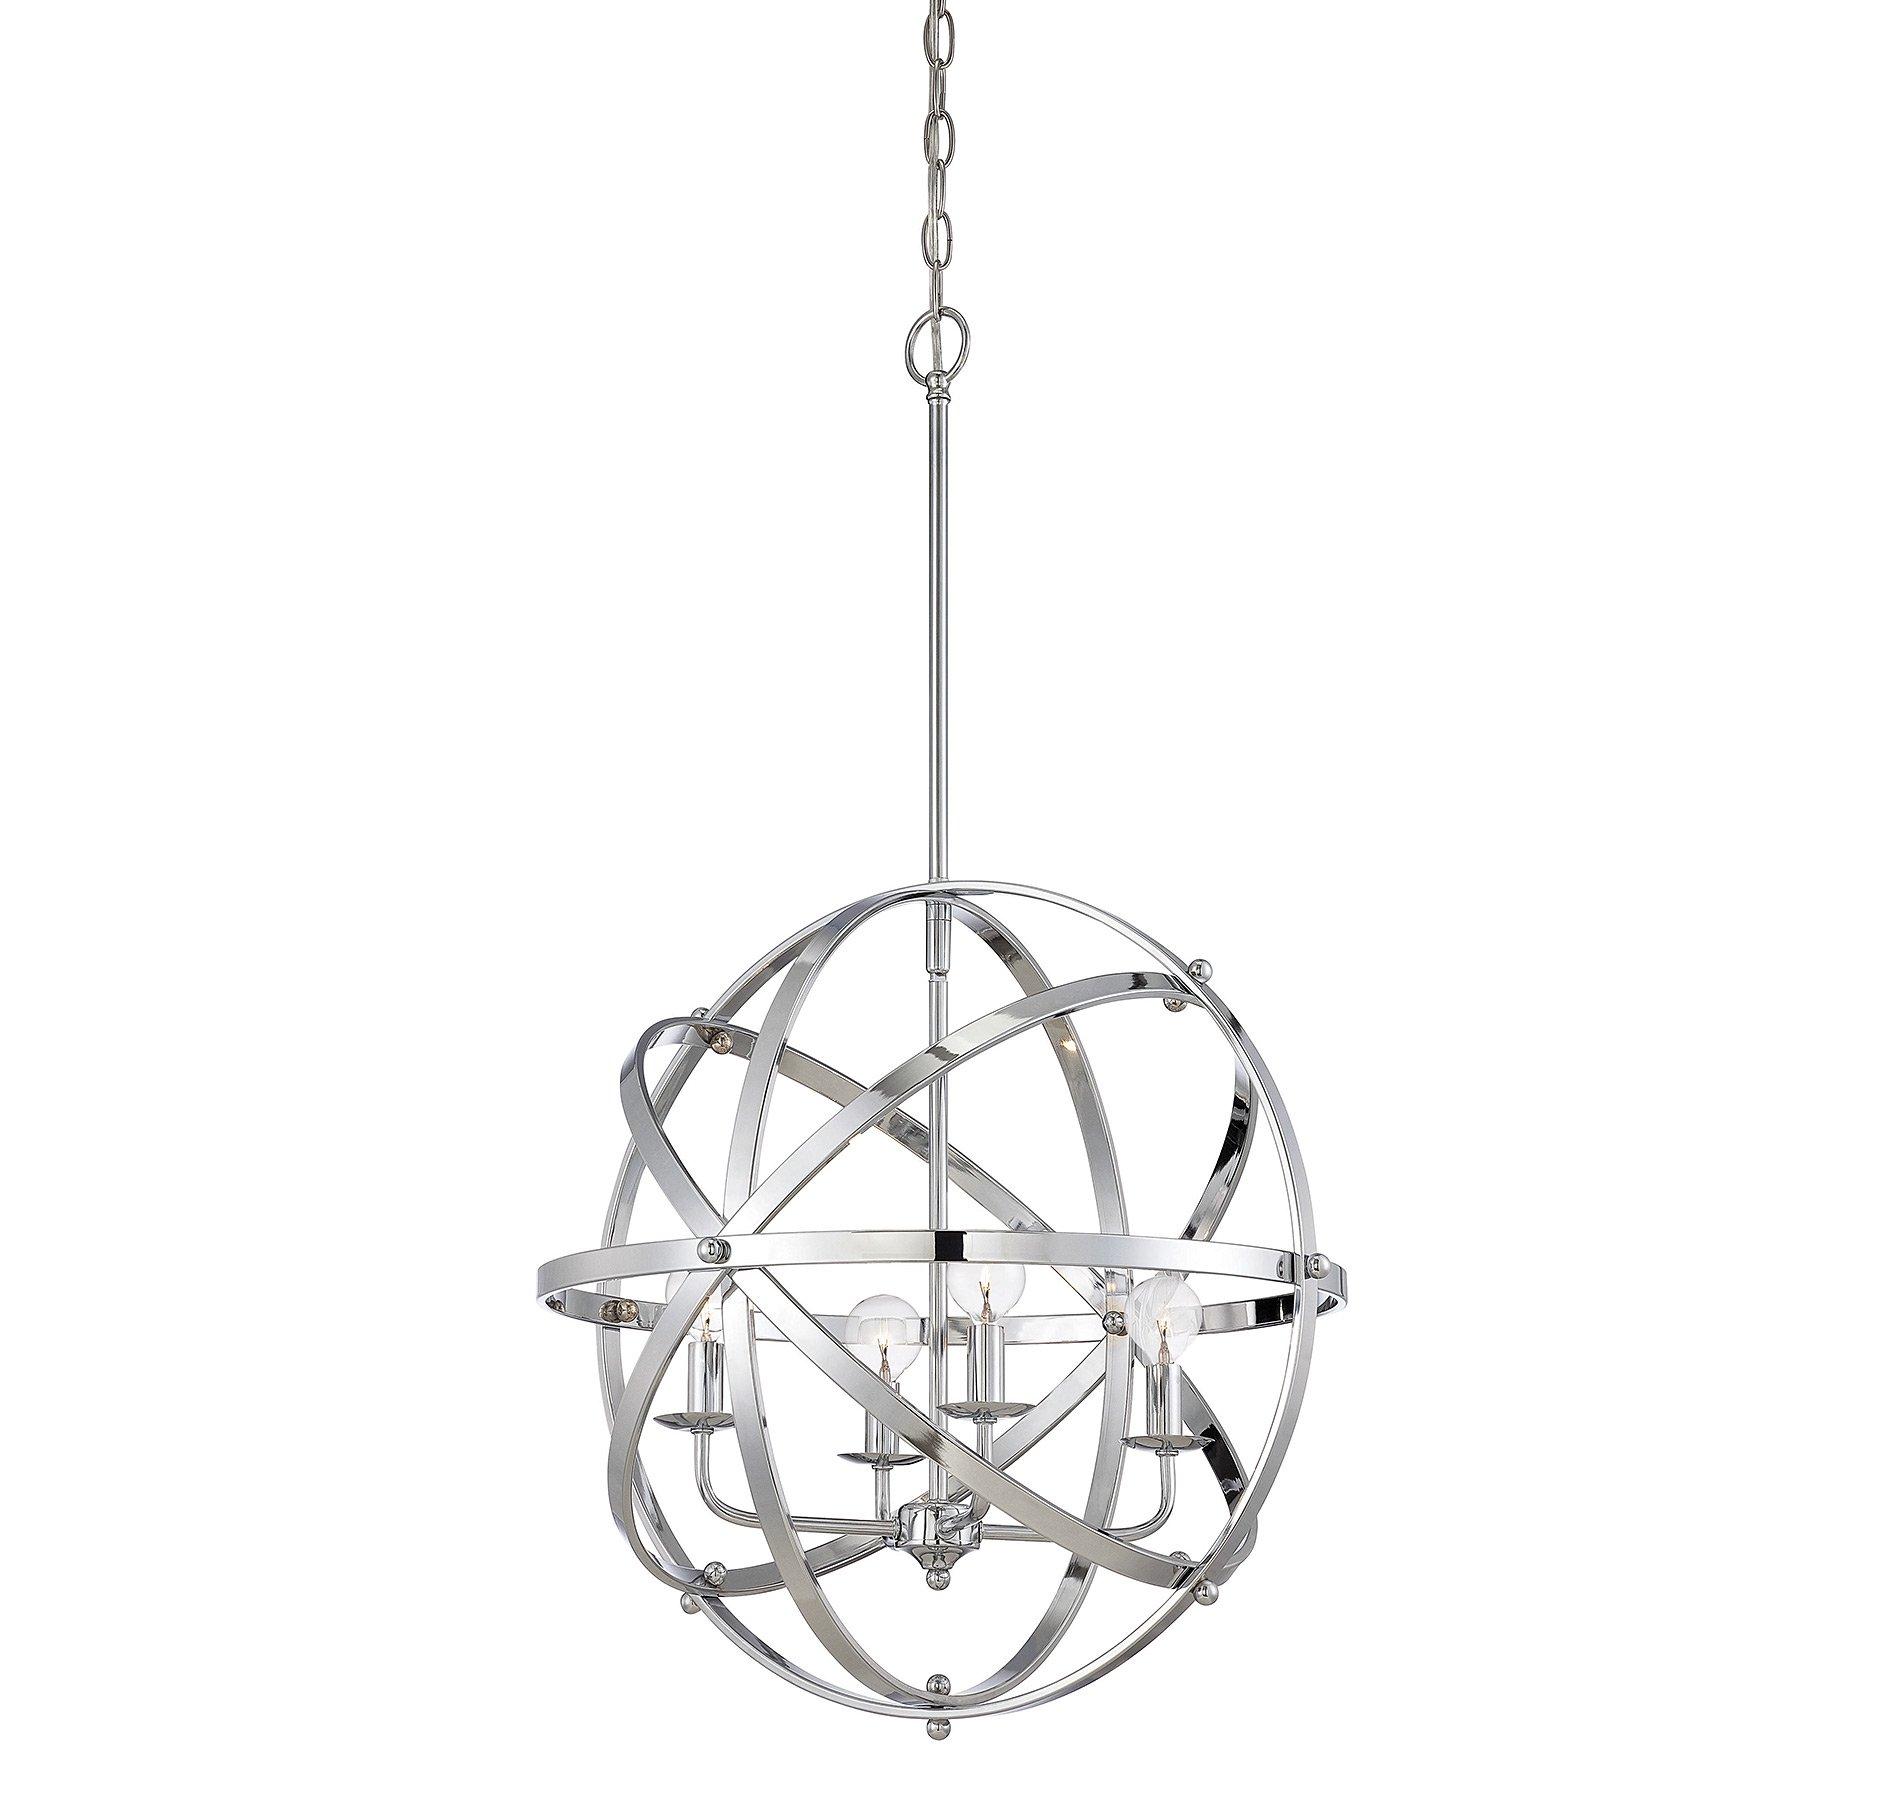 dias orb pendant by savoy house 743534ch - Savoy Lighting